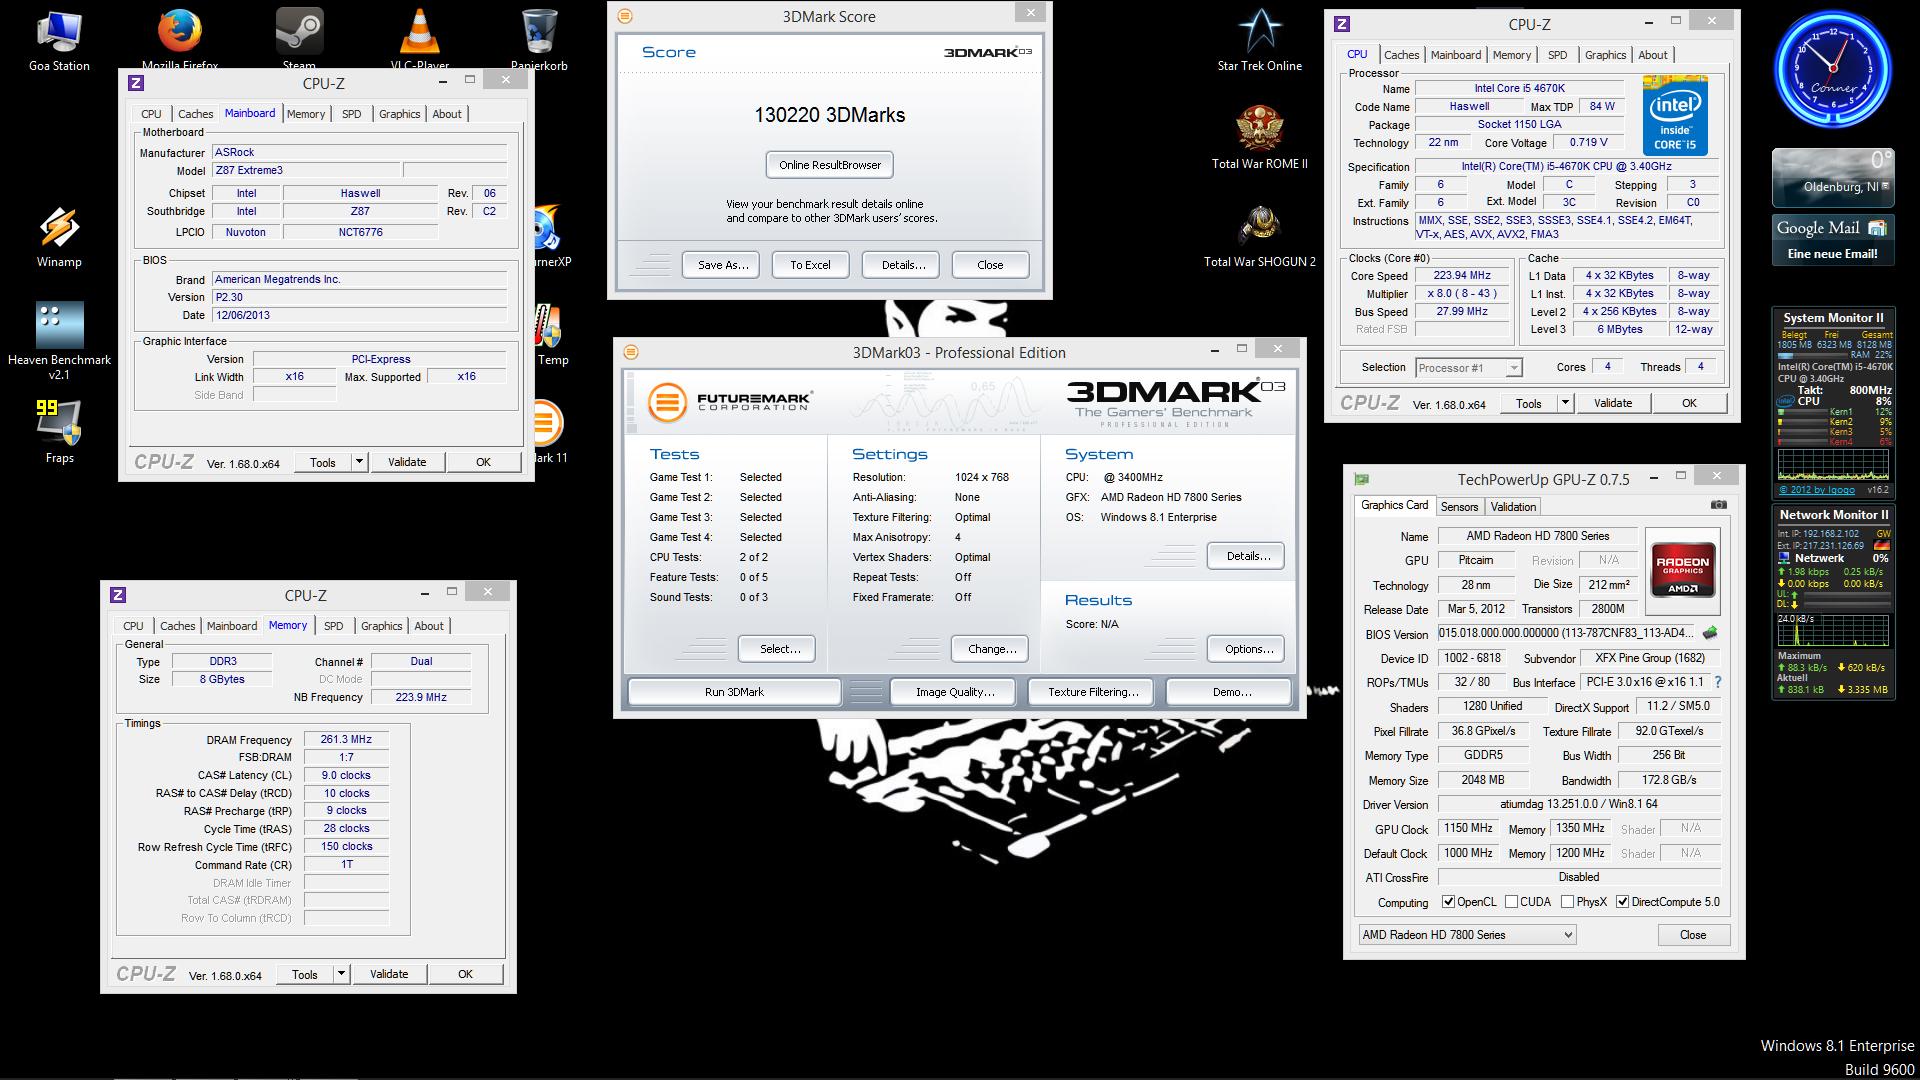 Benchmark Screen Shots